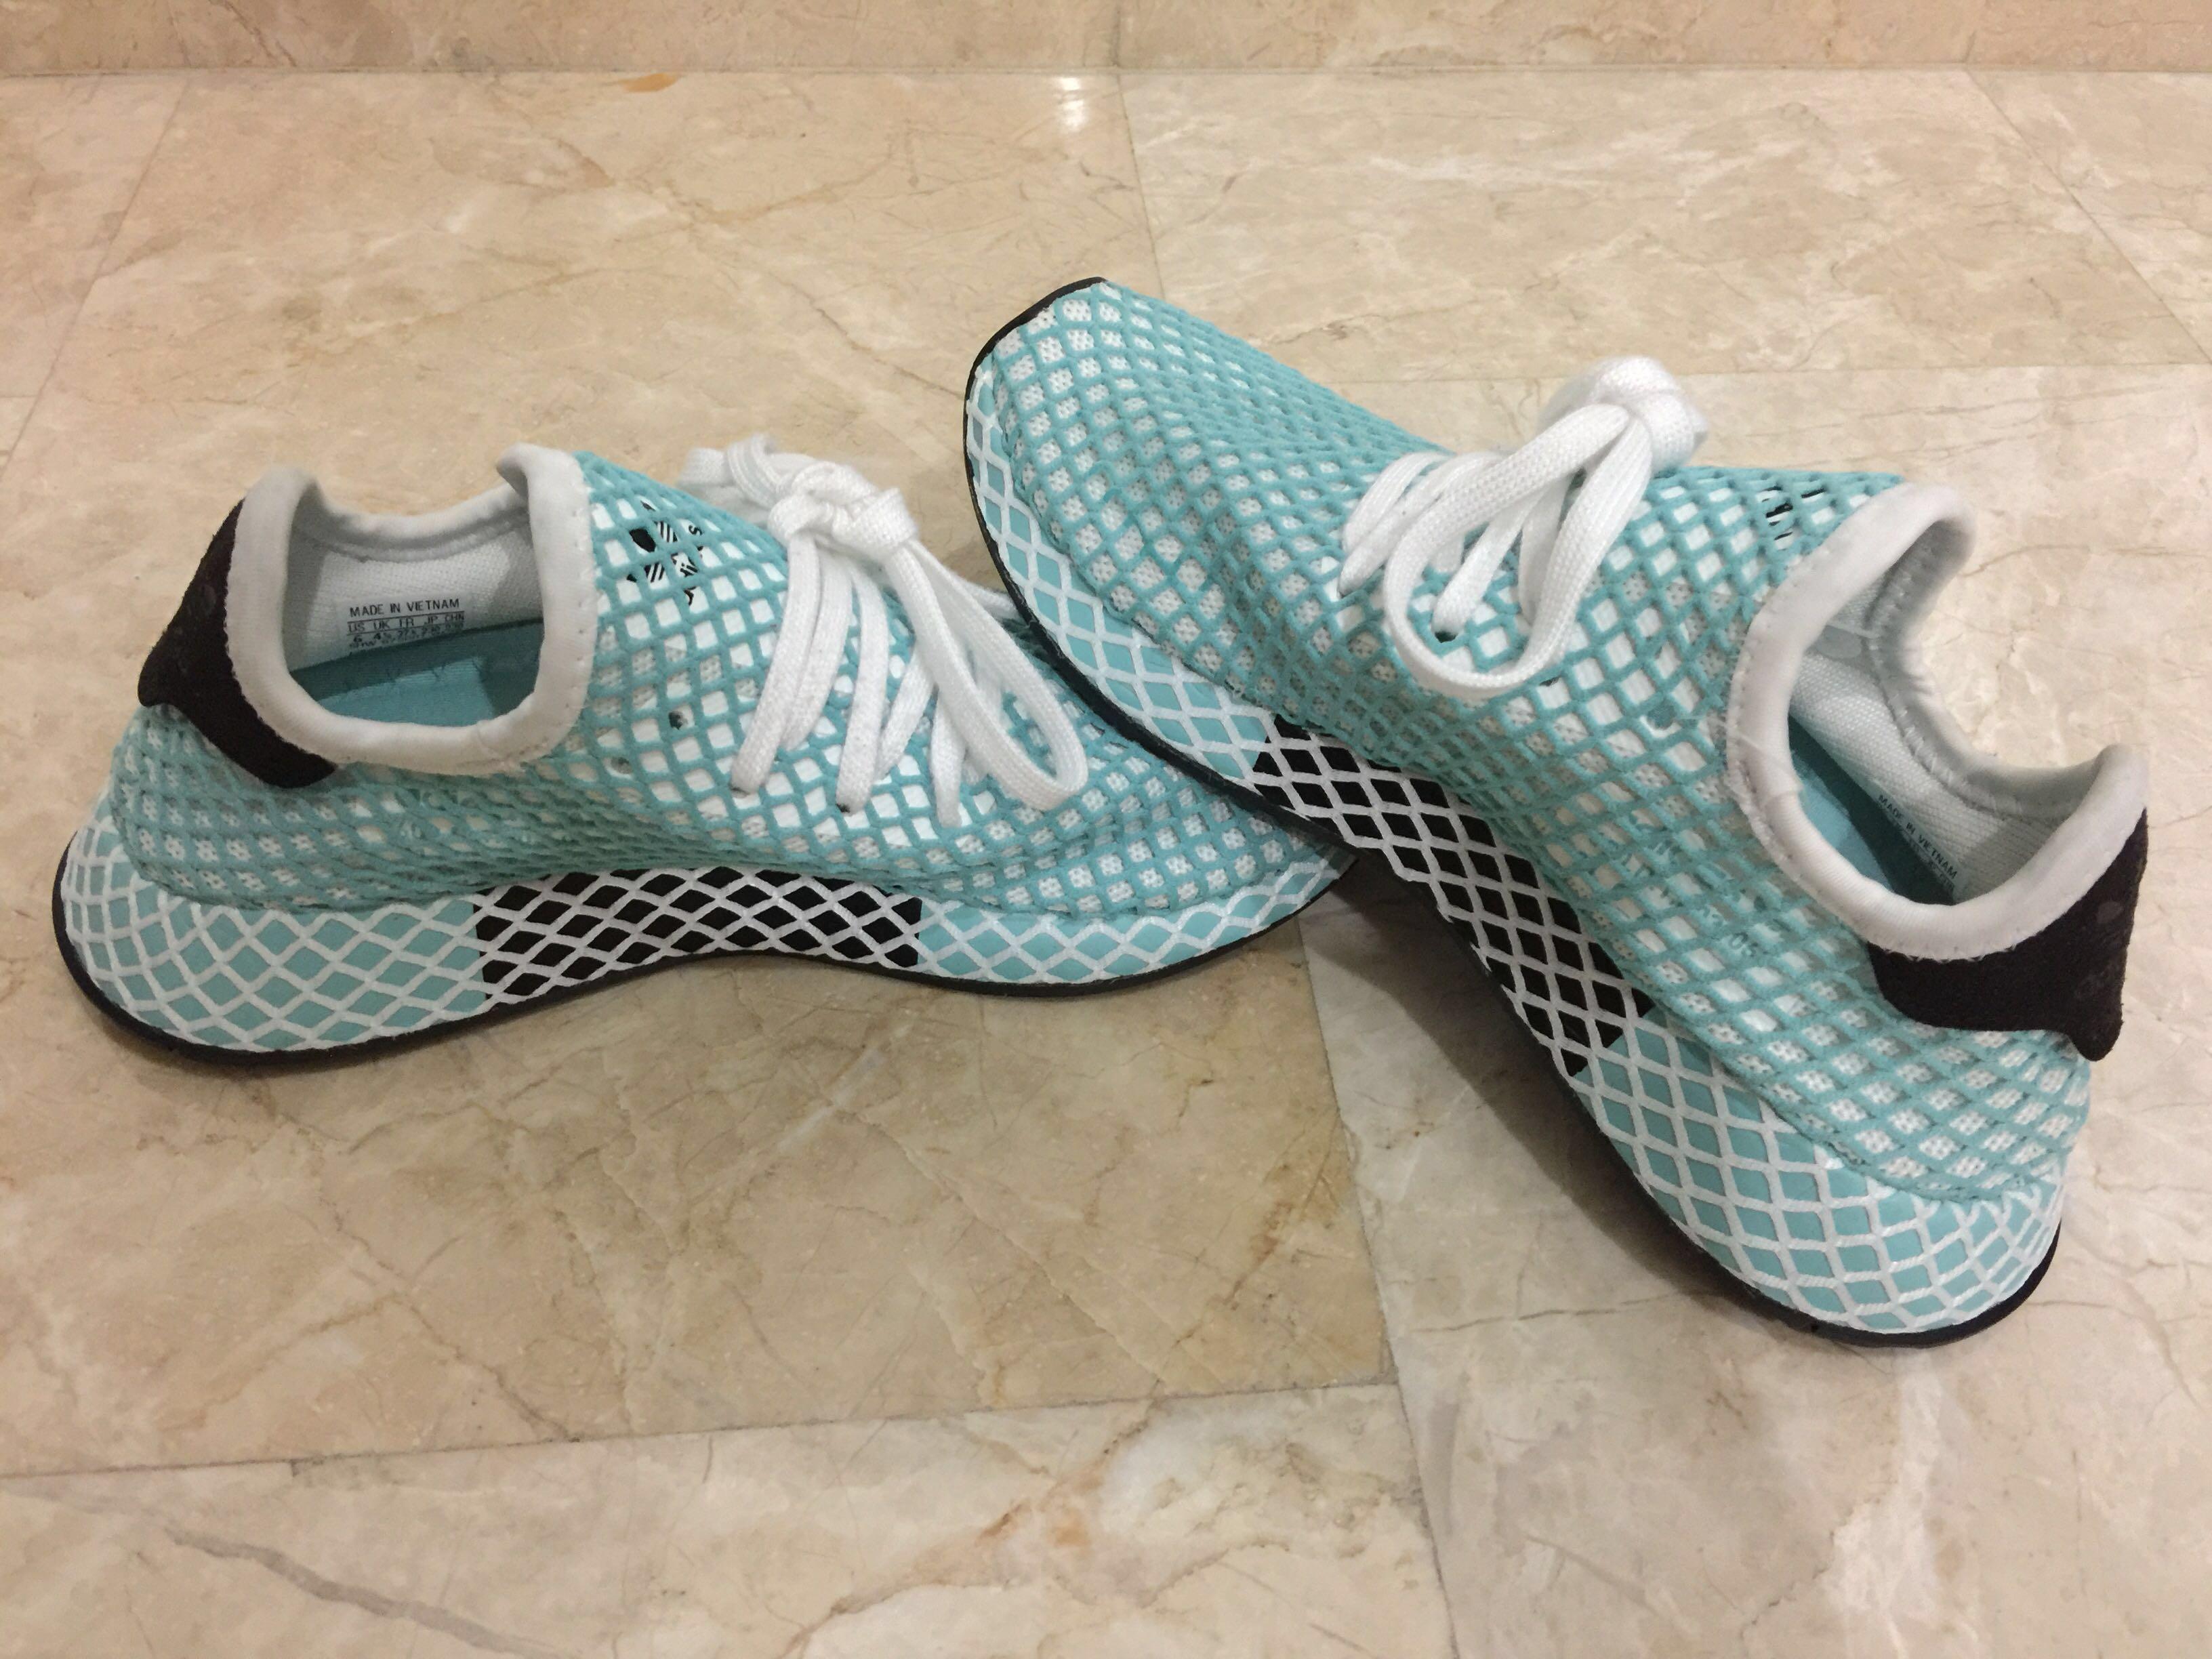 80100dddf LAST DEAL !! Adidas Deerupt Runner Parley For Ocean White CQ2908 ...